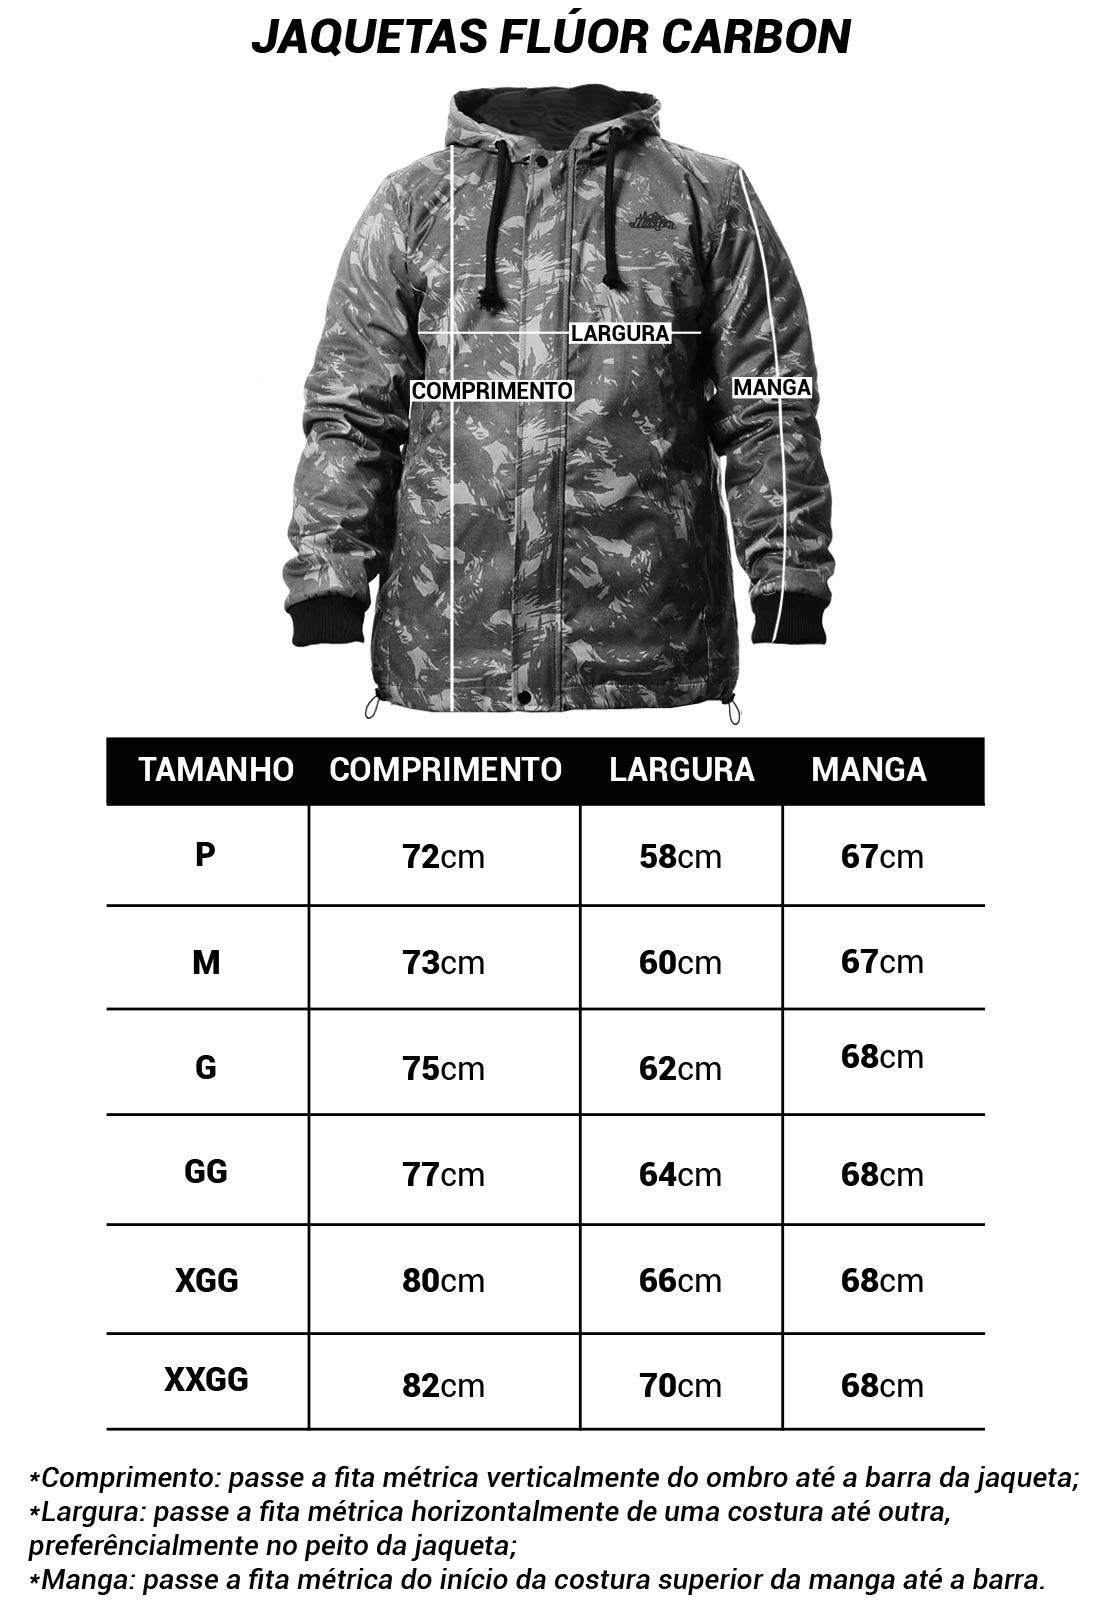 JAQUETA CAMUFLADA AMAZÔNIA FLÚOR CARBON MASCULINA  - REAL HUNTER OUTDOORS